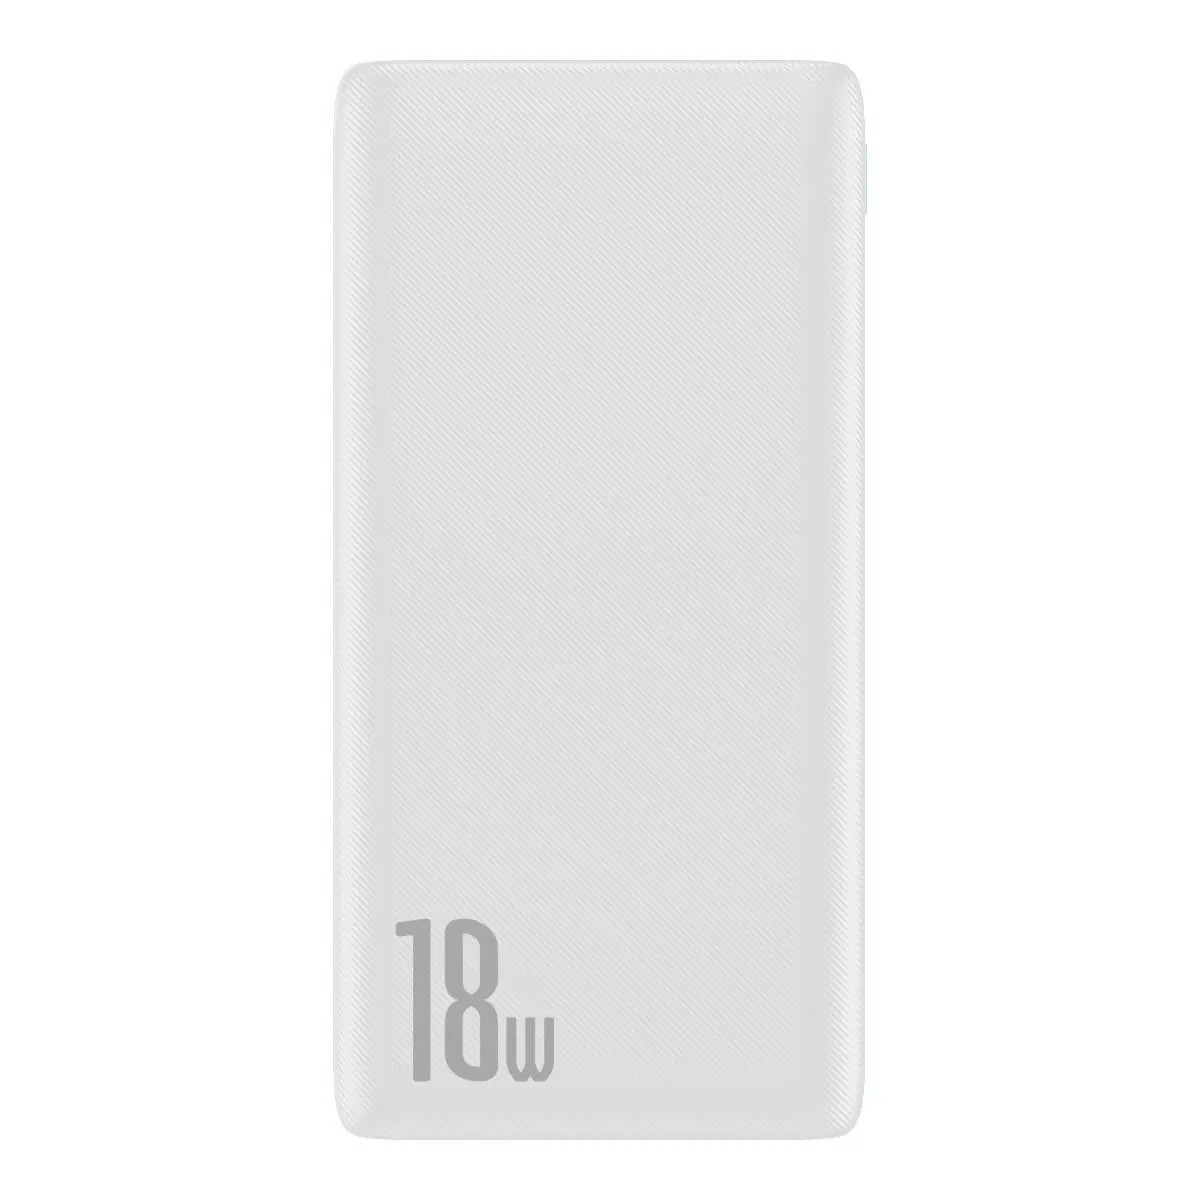 Carregador Portátil Baseus Power bank Bipow 10000mAh PD+QC 18w Branco